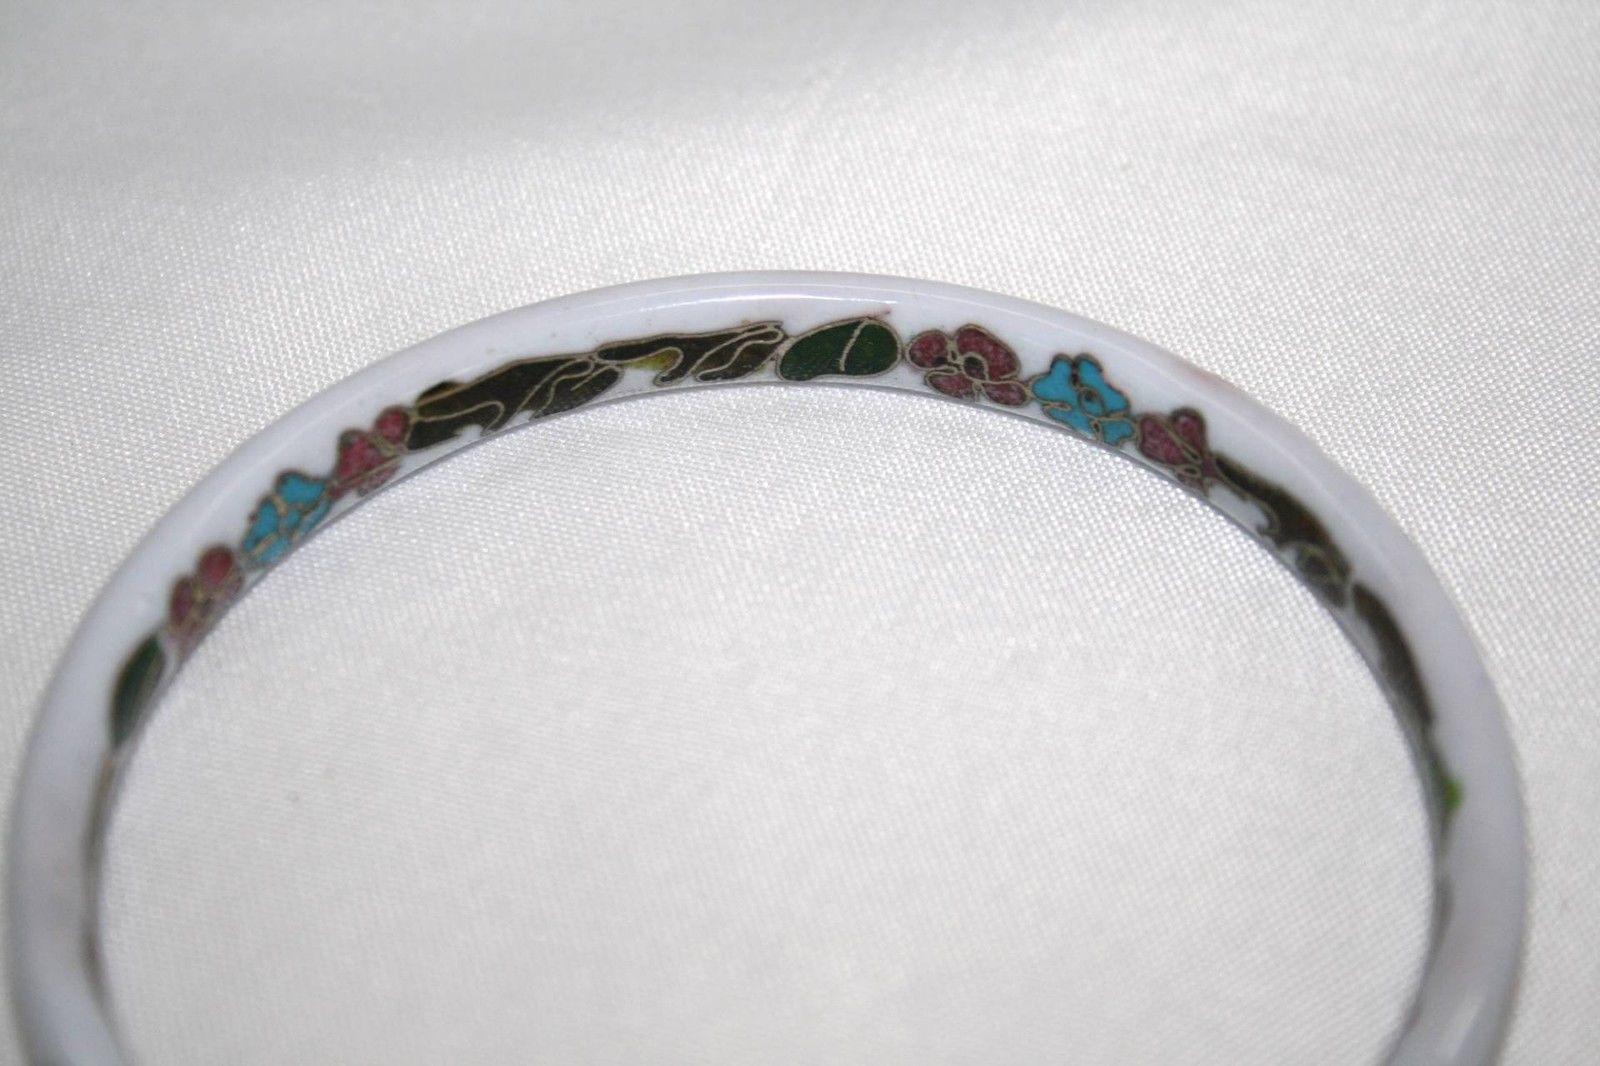 Vintage Glass Chinese White Floral Cloisonne Bangle Bracelet J116RJ